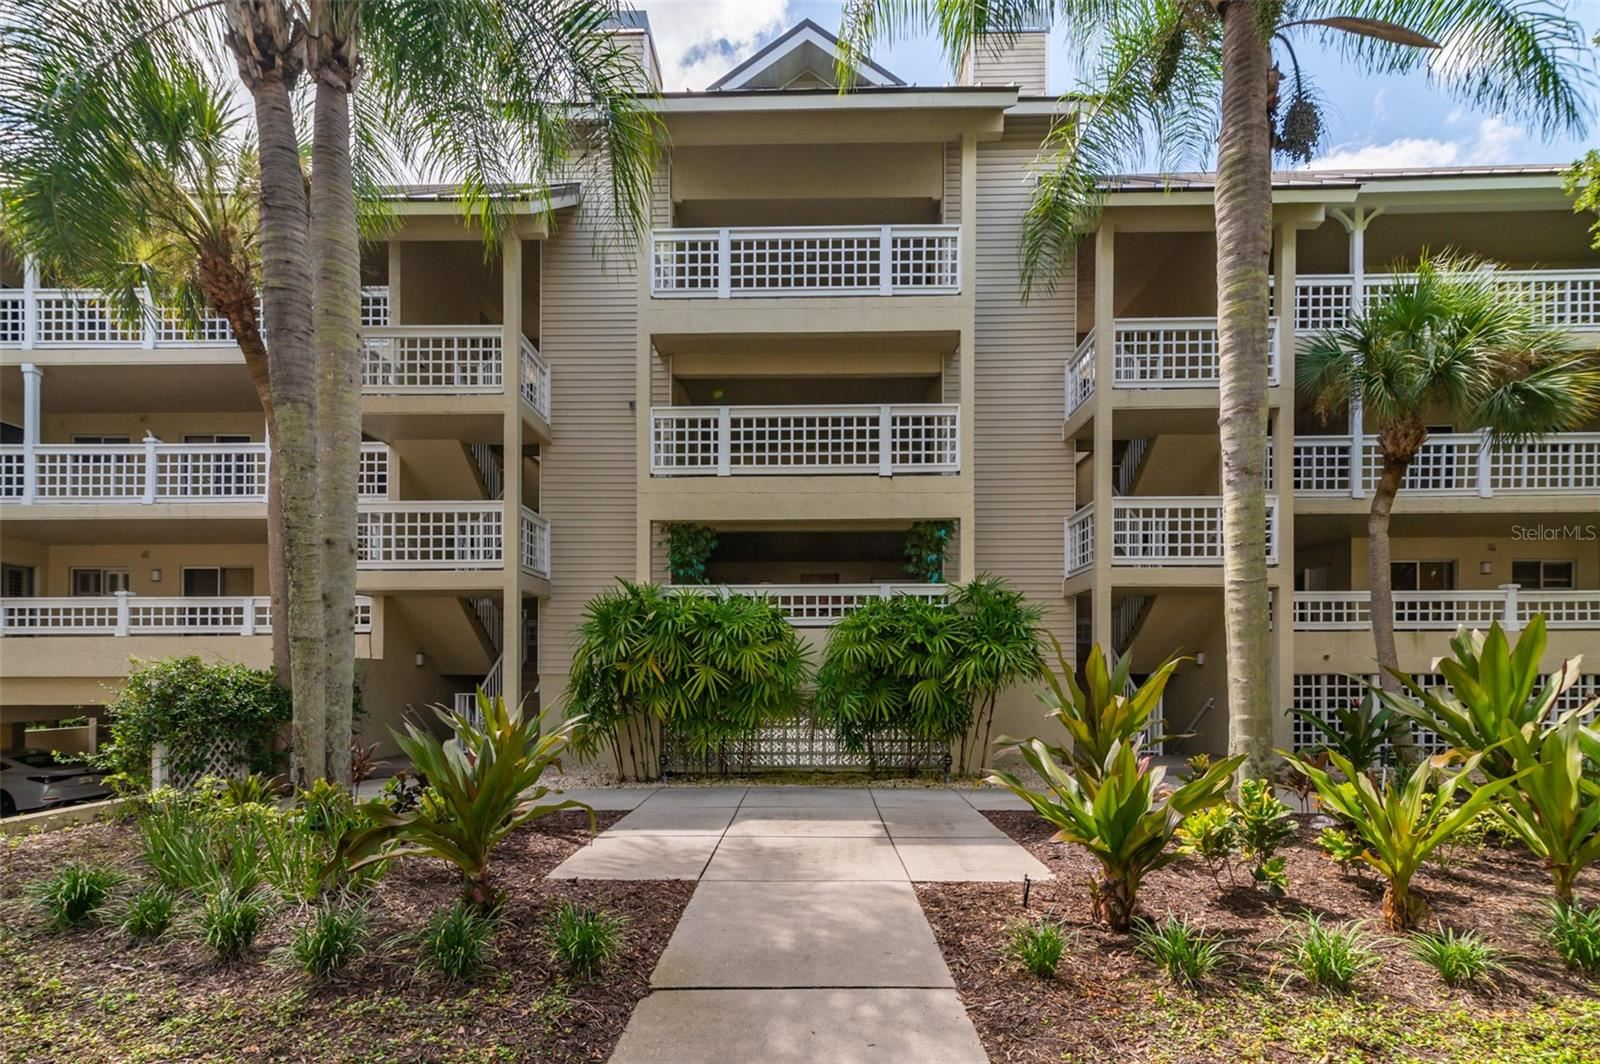 Photo of 1762 BAY STREET #202, SARASOTA, FL 34236 (MLS # A4512138)